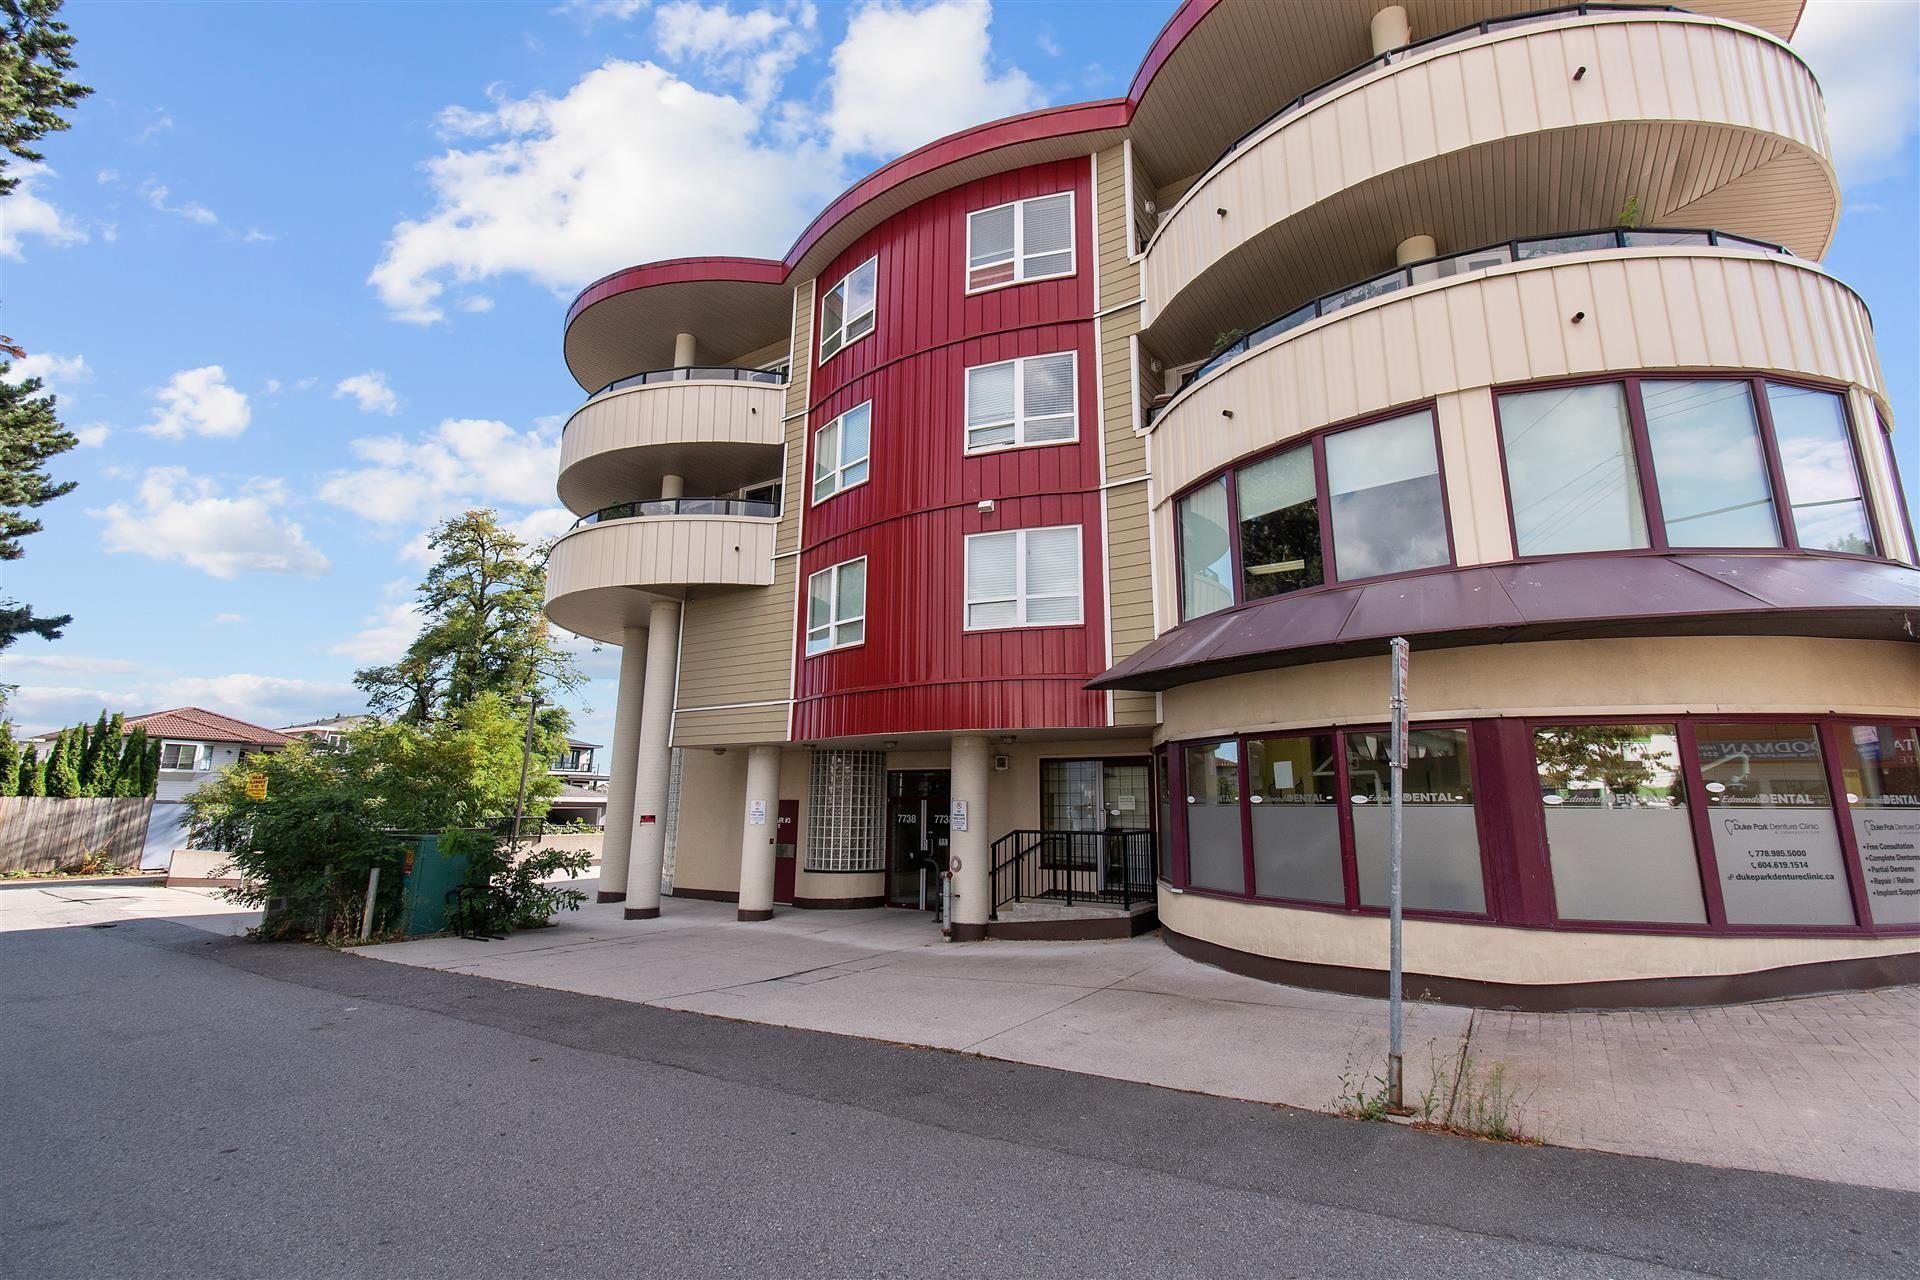 Main Photo: 309 7738 EDMONDS Street in Burnaby: East Burnaby Condo for sale (Burnaby East)  : MLS®# R2613098